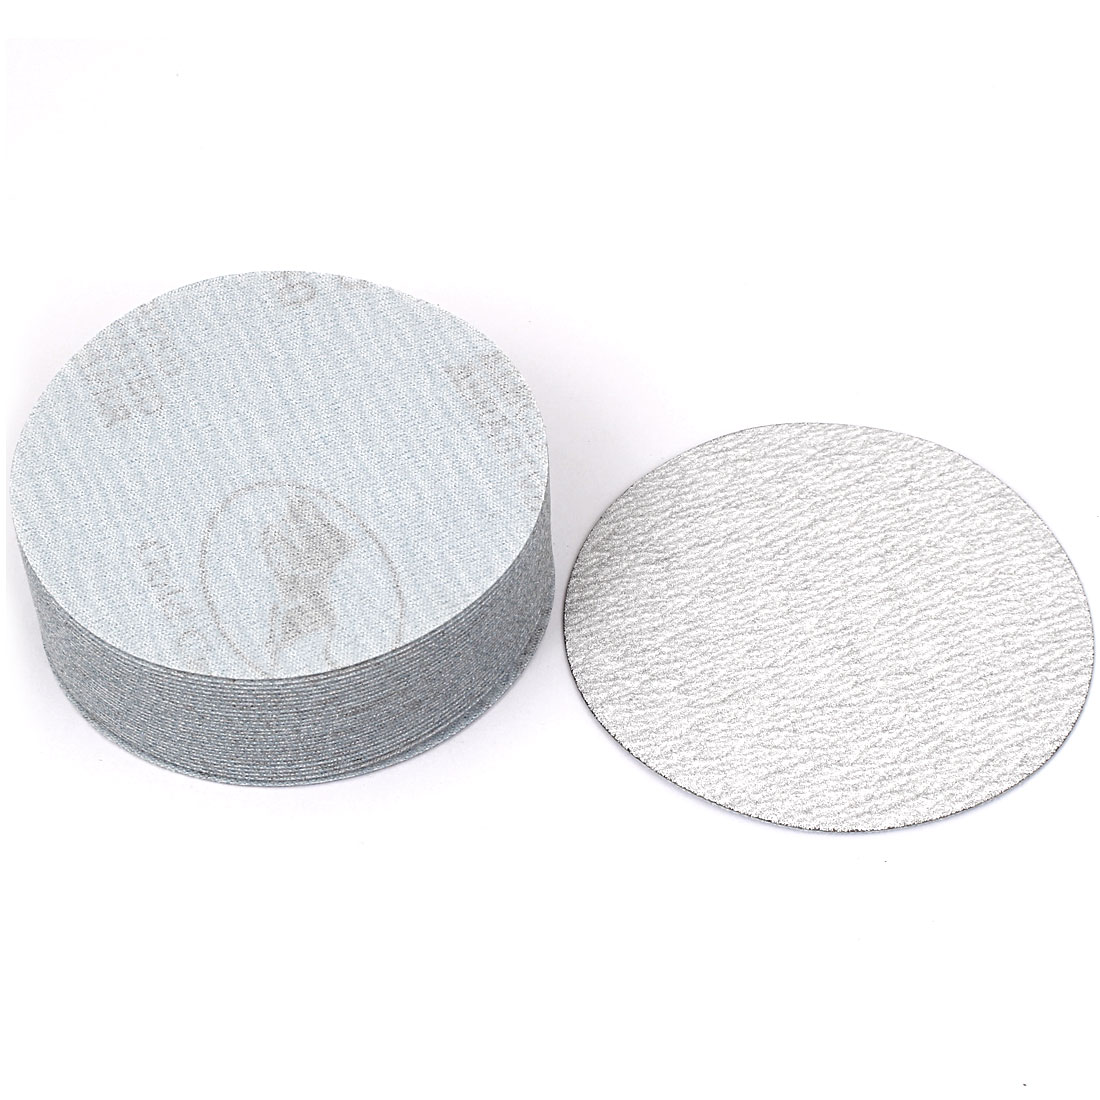 "4"" Dia Polishing Round Dry Abrasive Sanding Sandpaper Sheet Disc 240 Grit 30 Pcs"